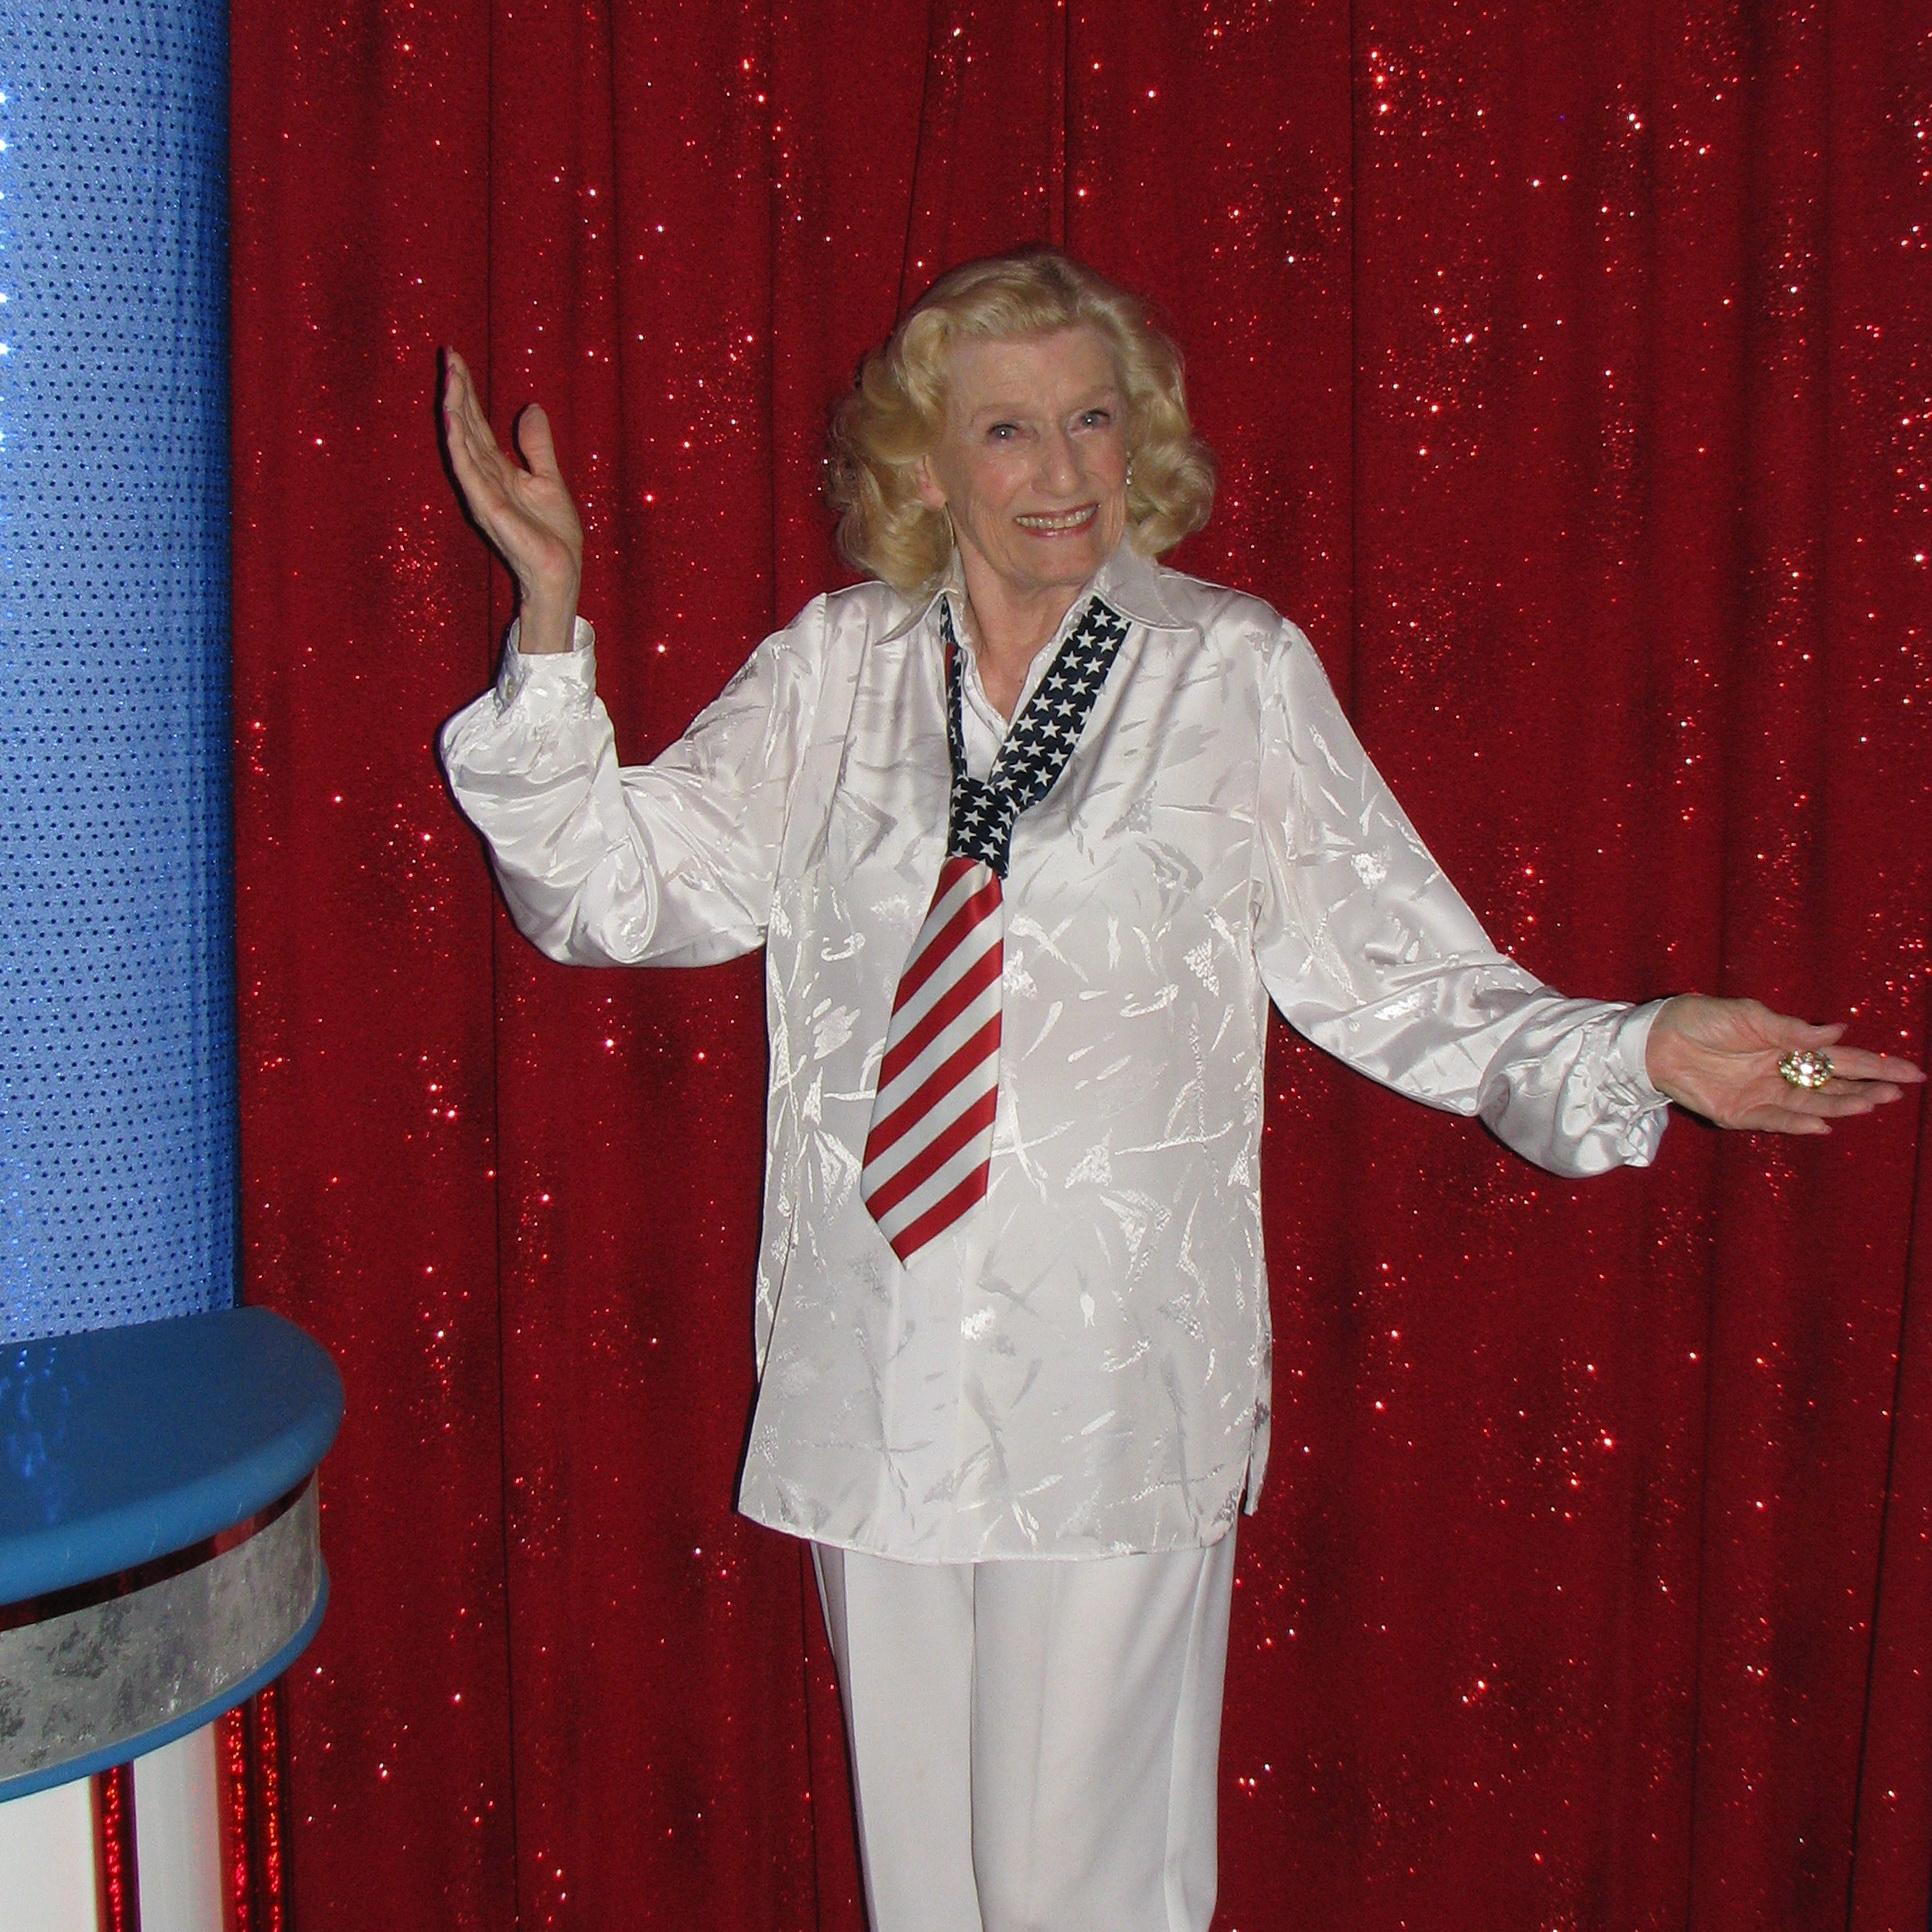 Miriam Nelson, 1919-2018